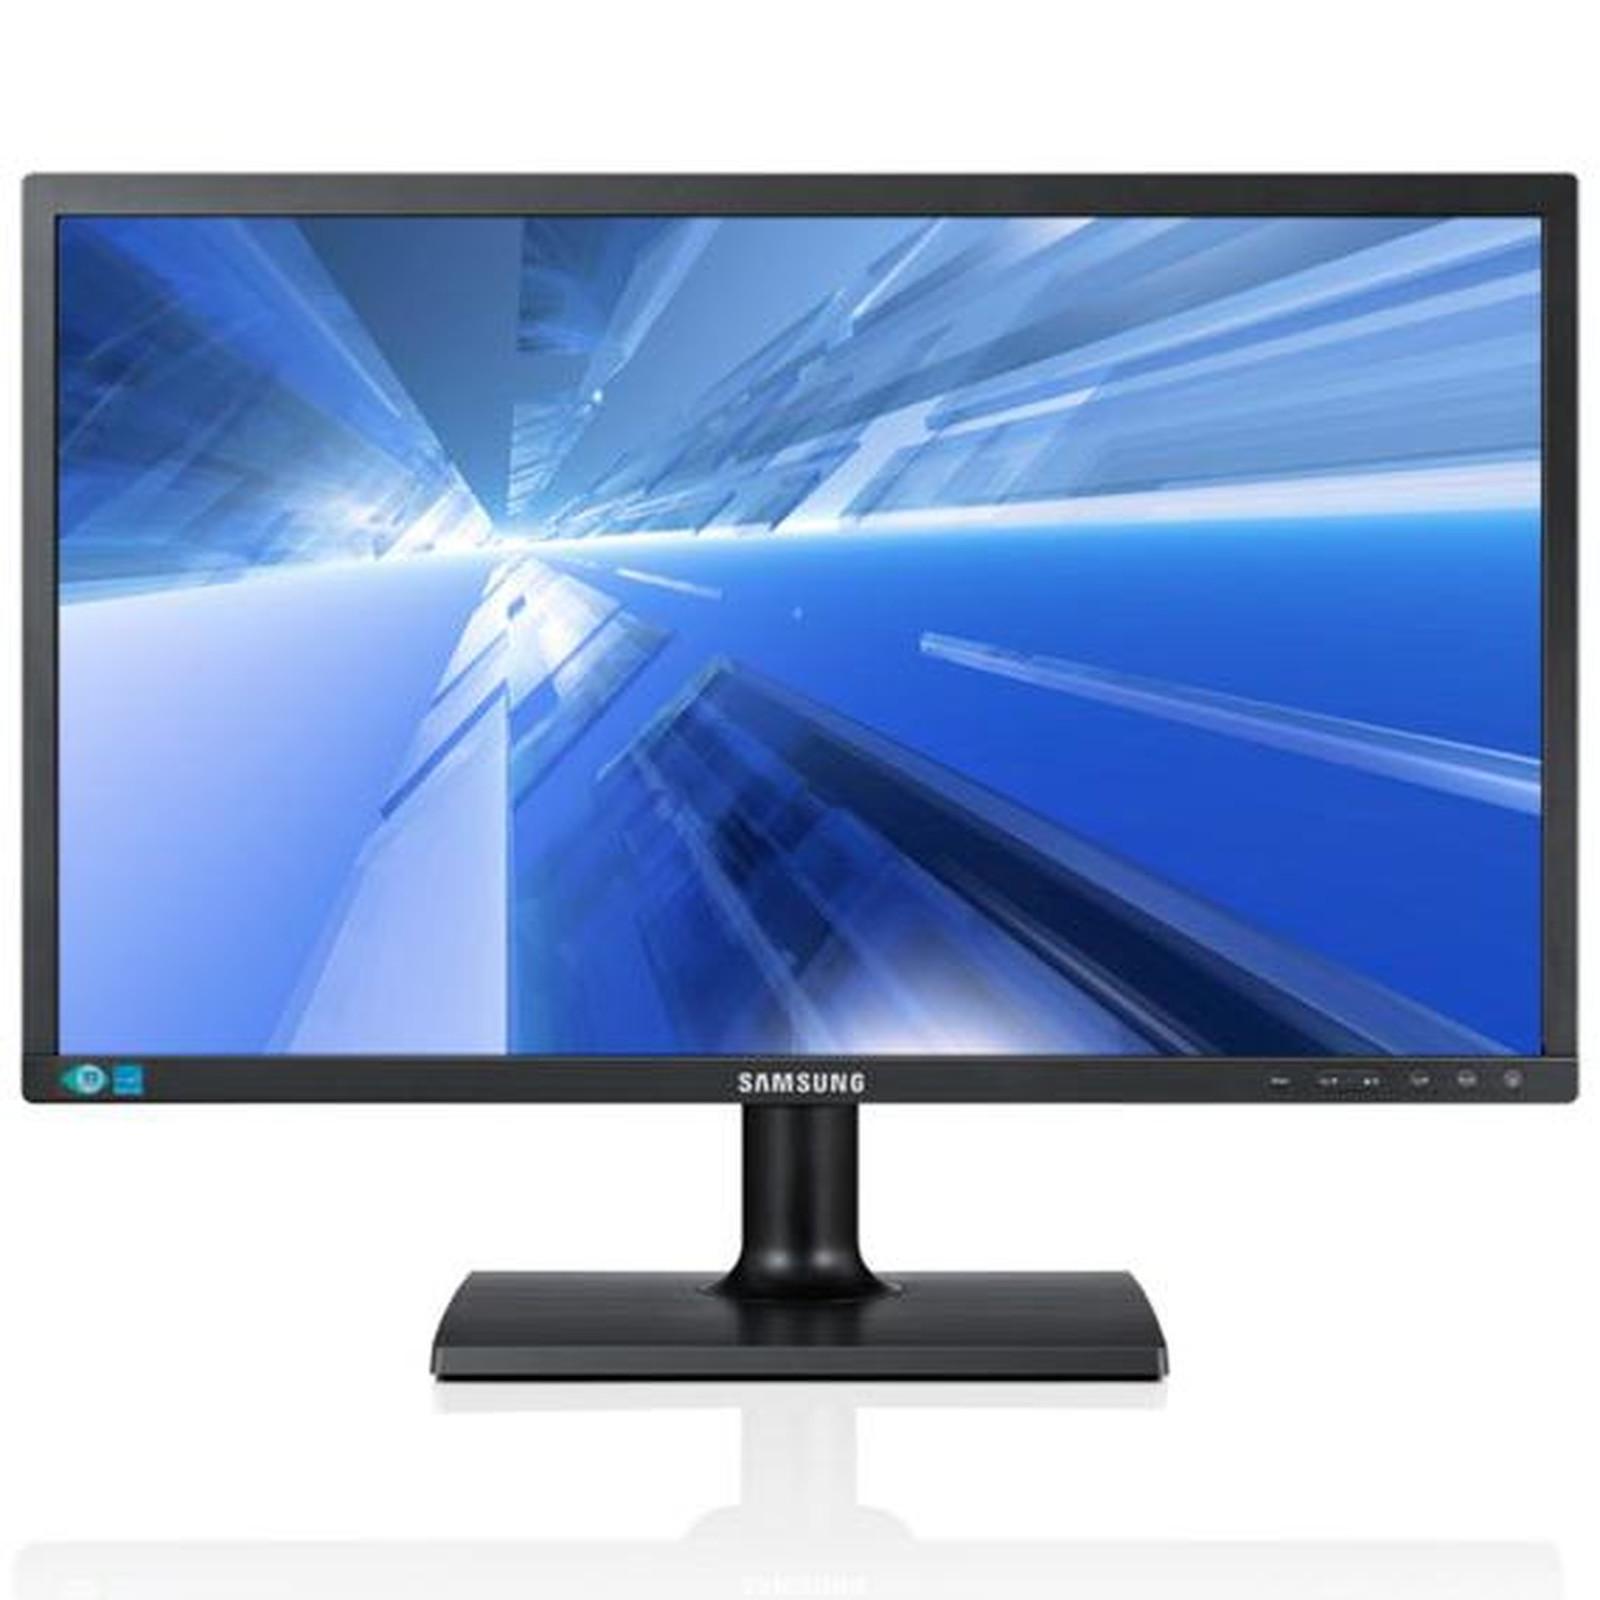 "Samsung 21.5"" LED - SyncMaster S22C200B"